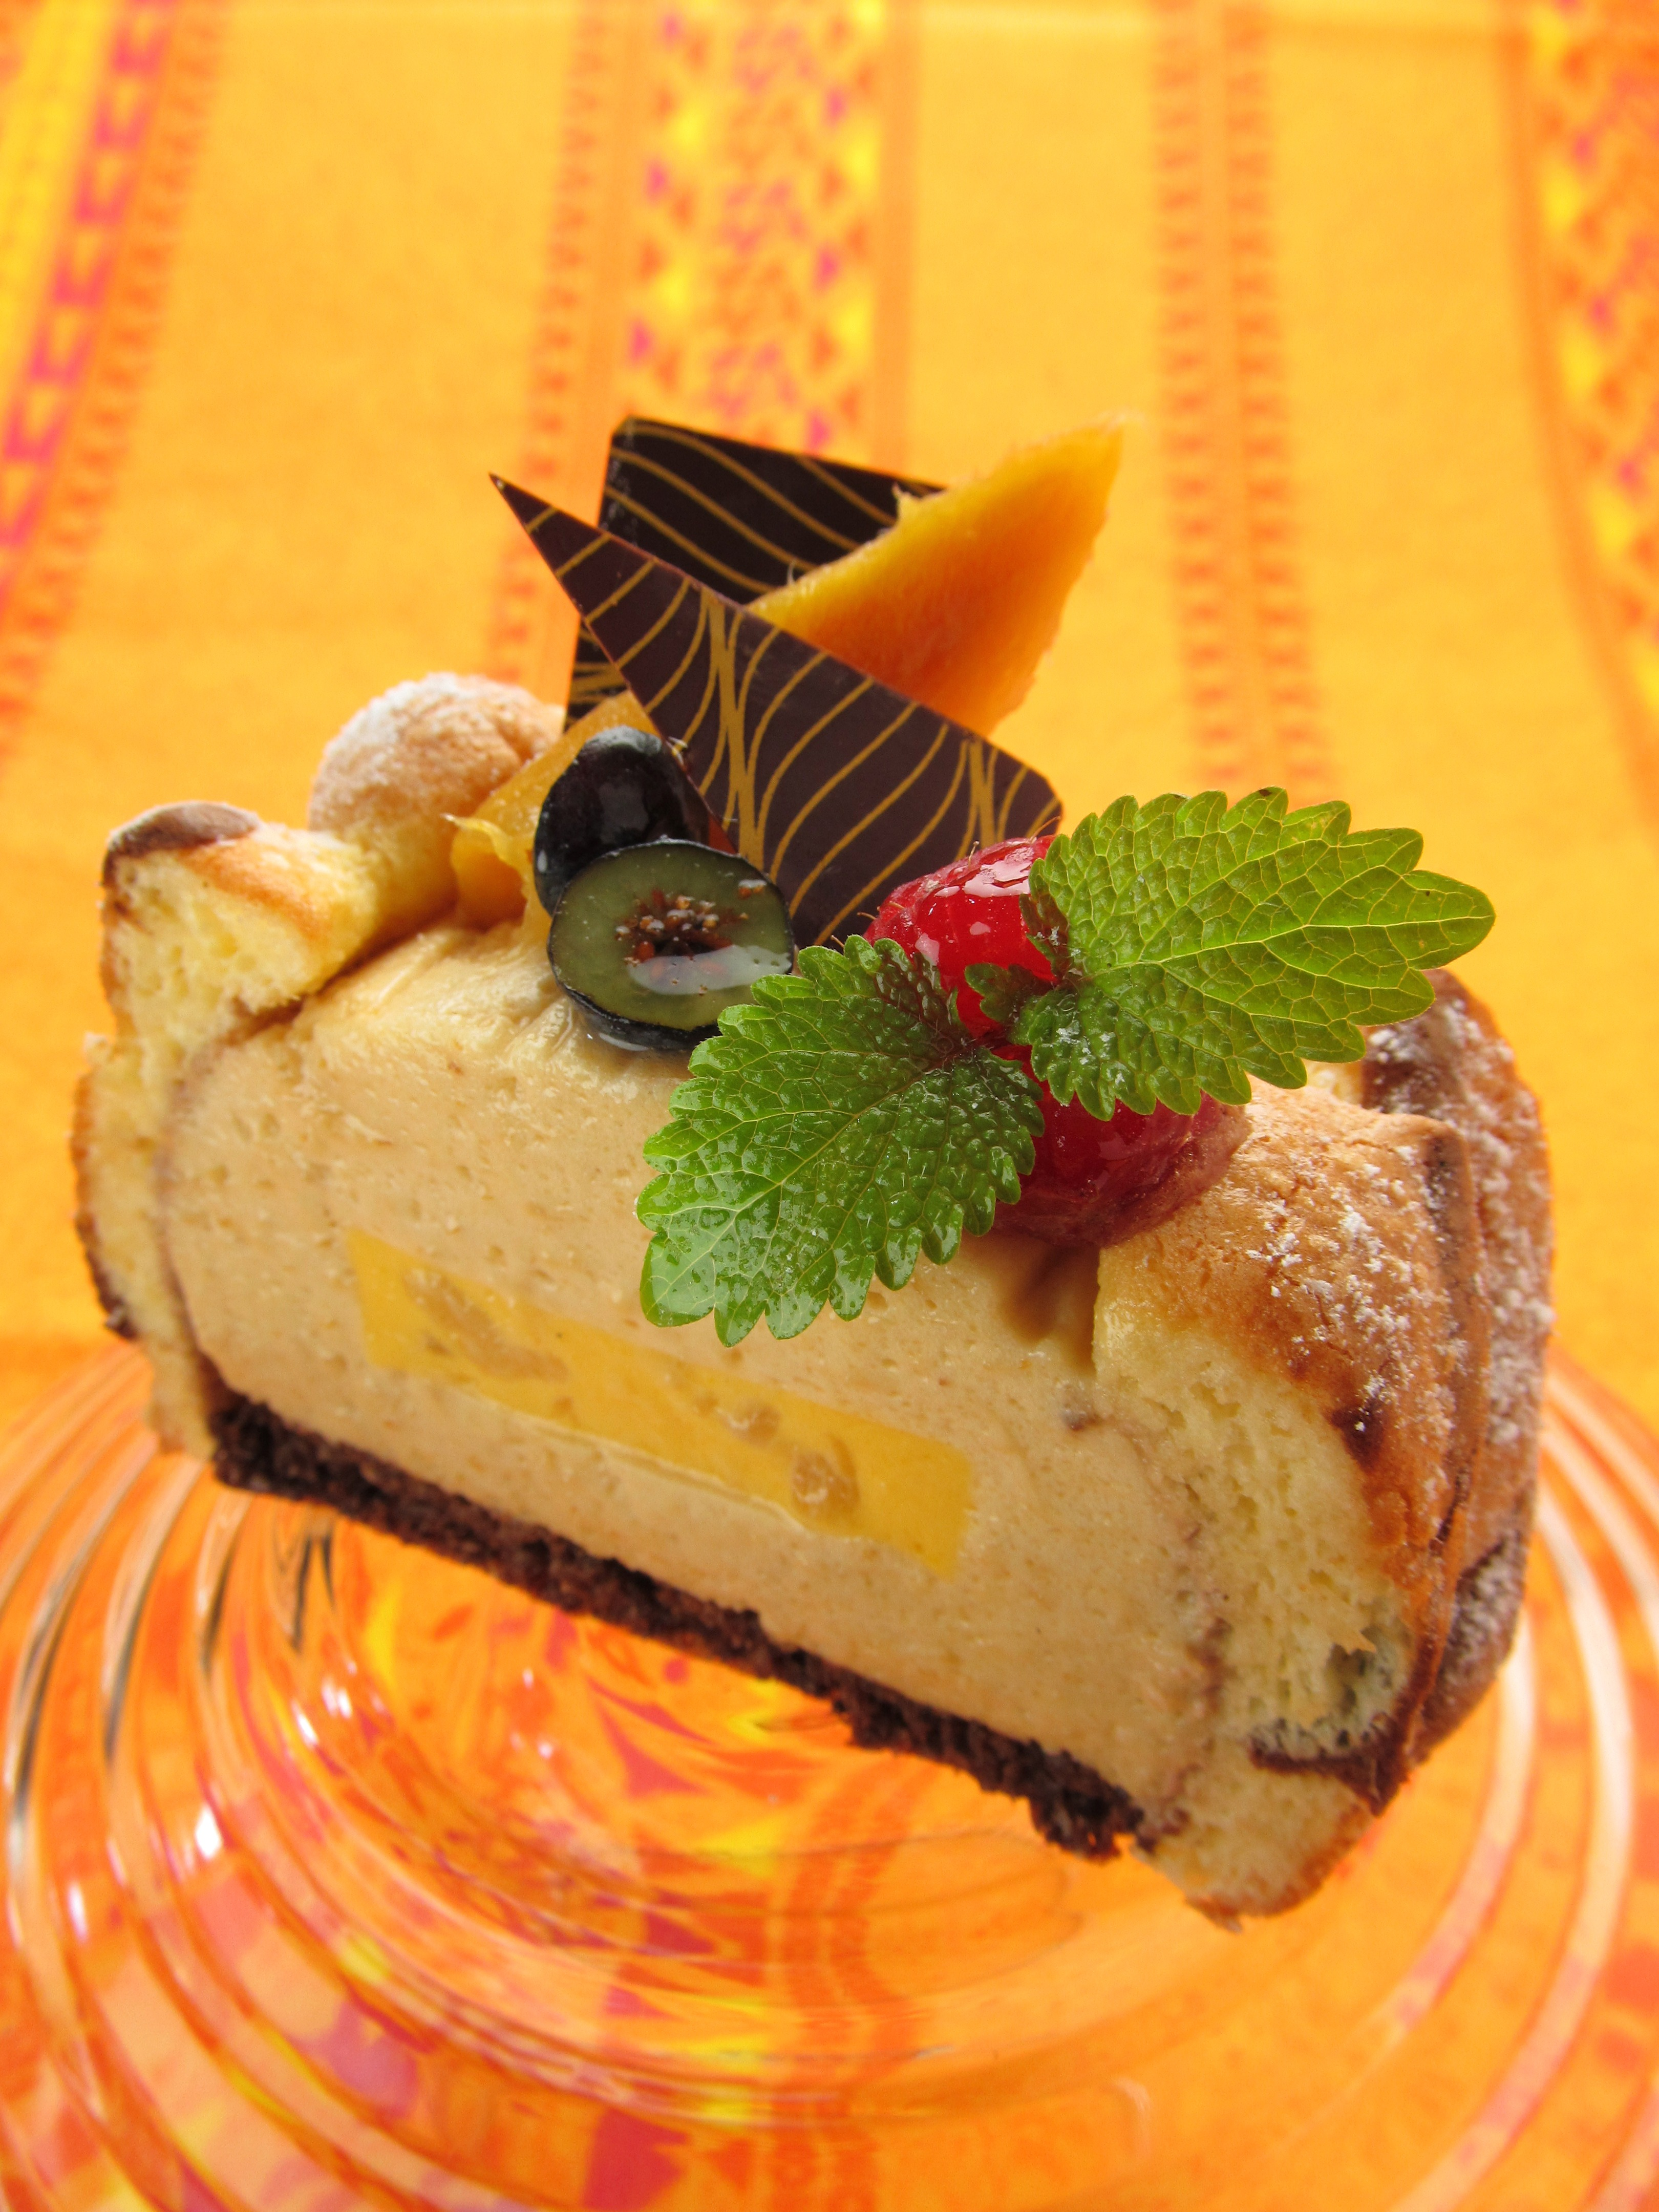 cake-tahiti-mango-dessert-65912.jpeg (3240×4320)